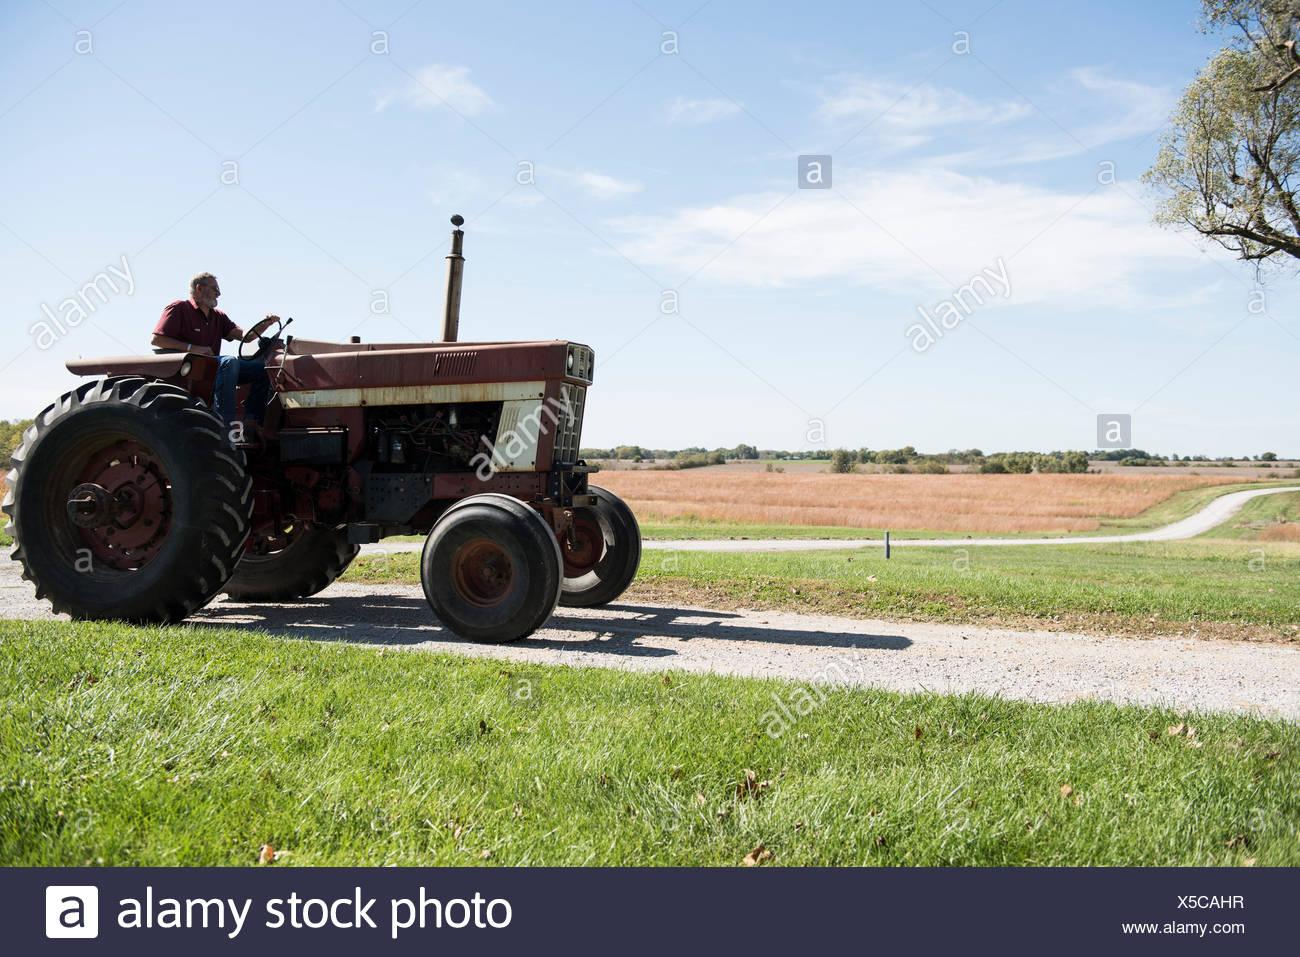 Farmer driving tractor on rural road, Missouri, USA - Stock Image